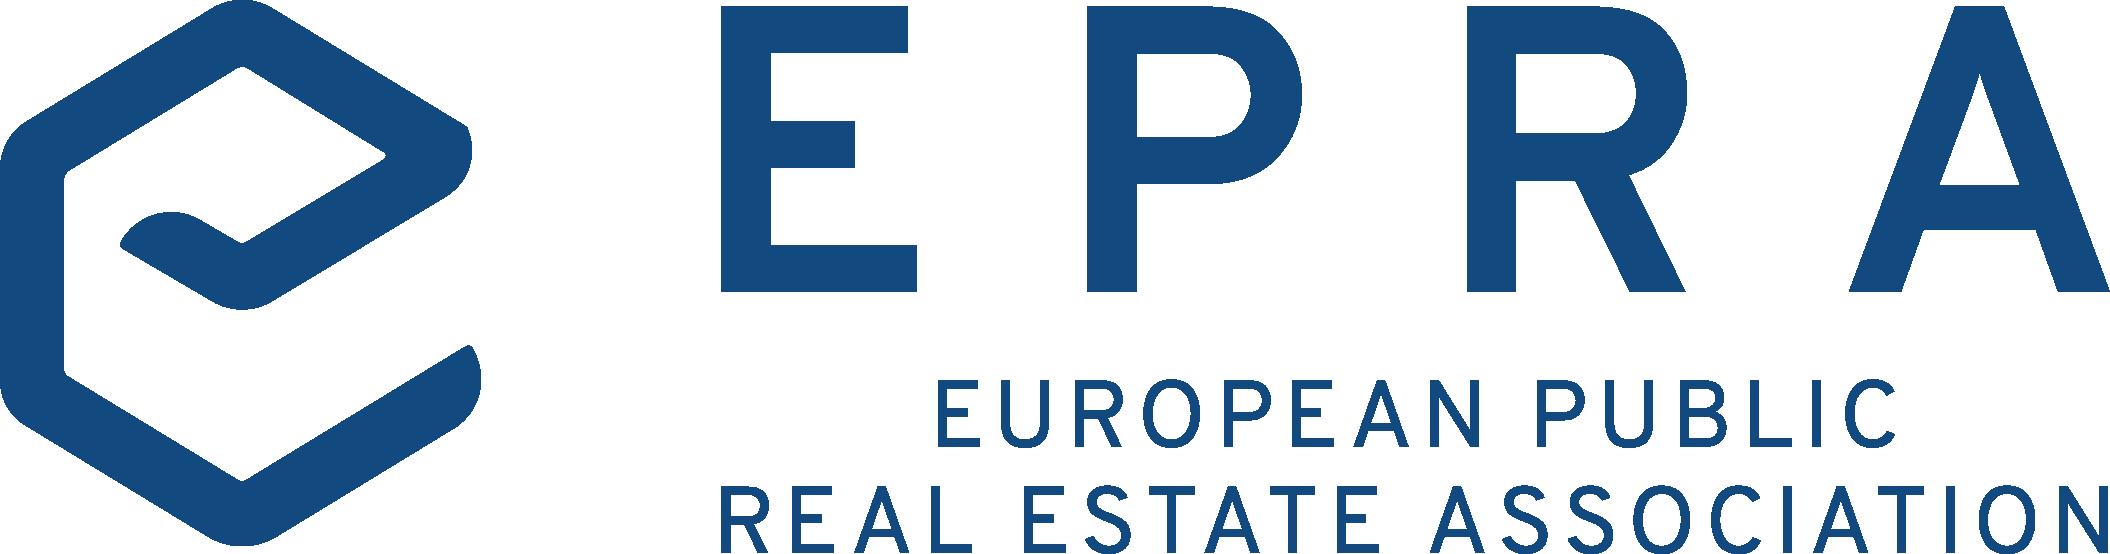 European Public Real Estate Association